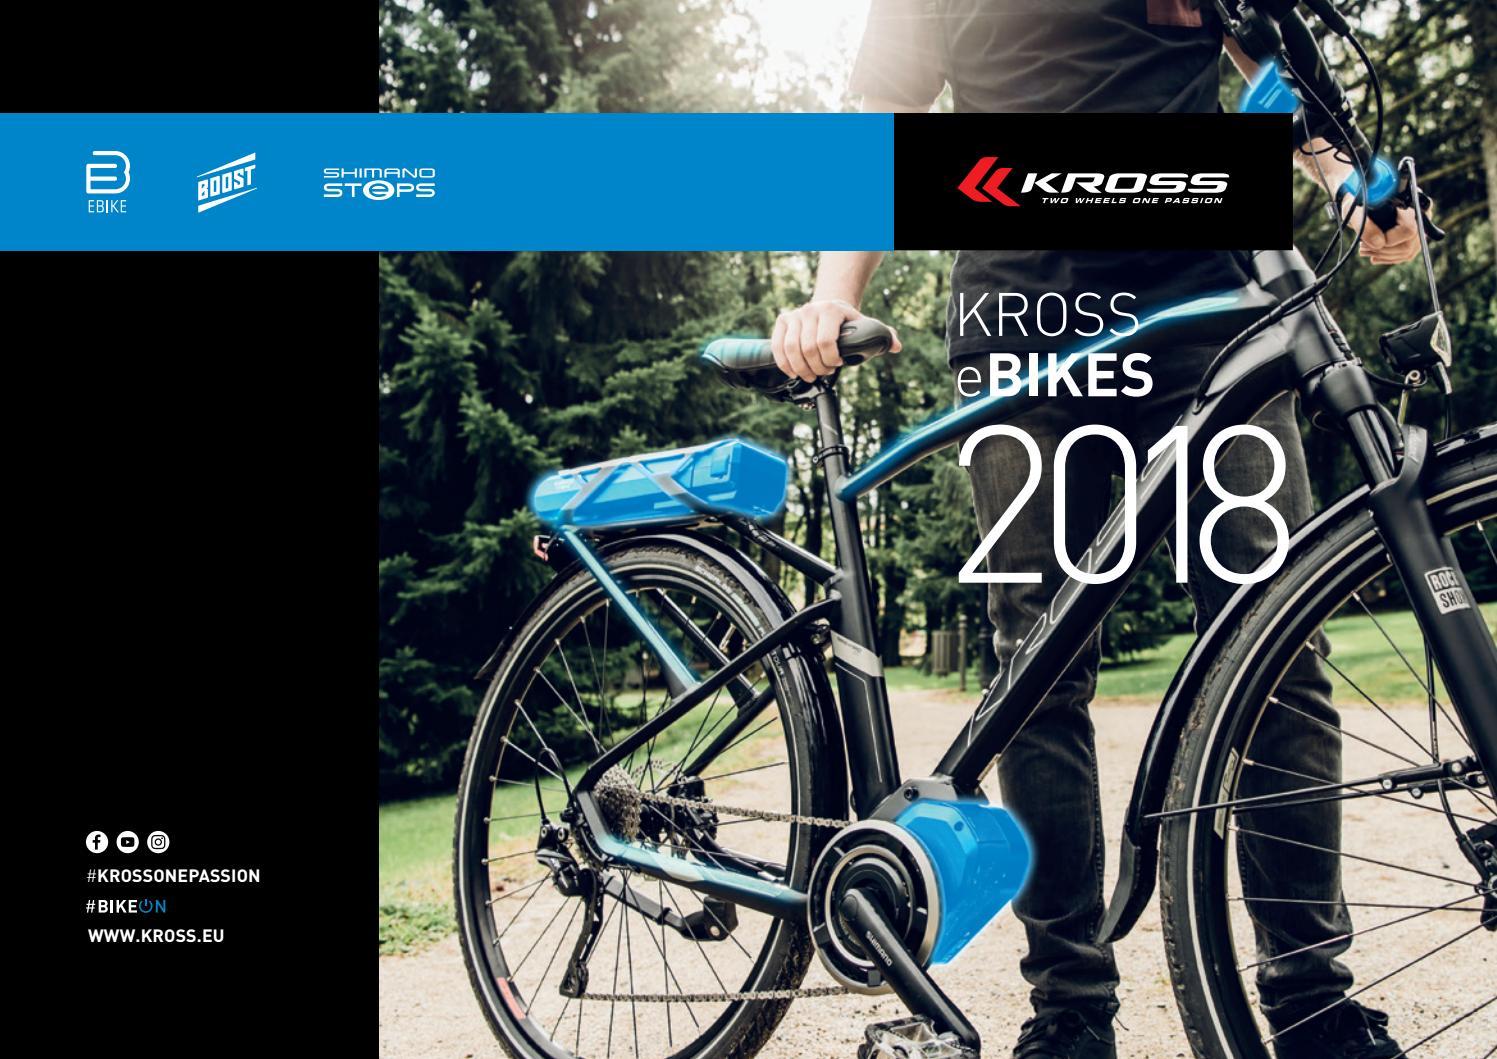 Kross ebike 2018 by Sim Sport - issuu